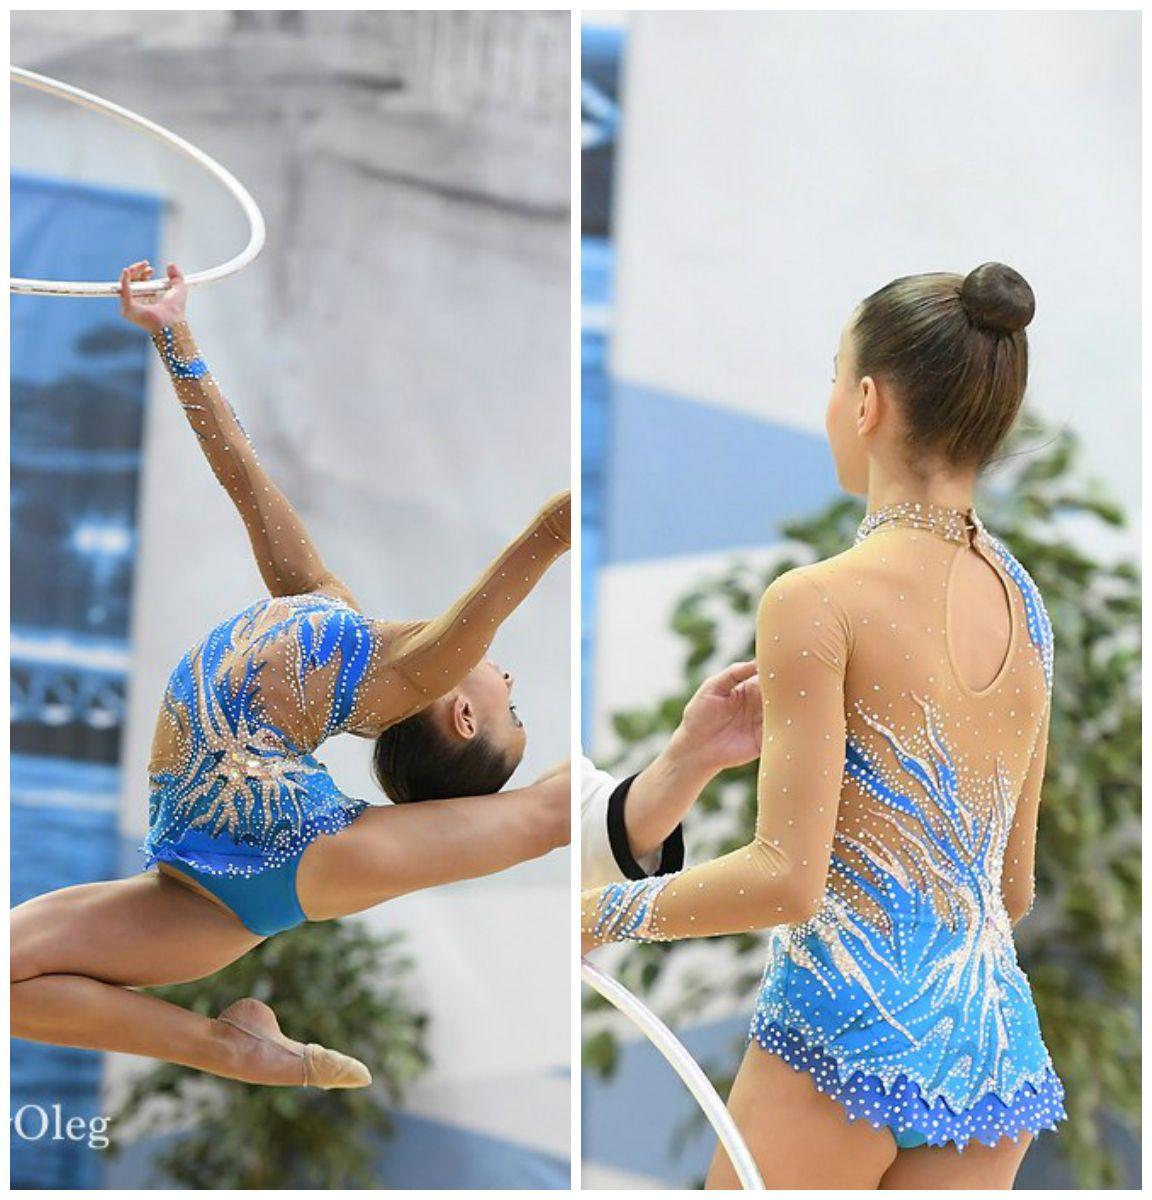 Rhythmic gymnastics leotard (photos by Oleg Naumov)